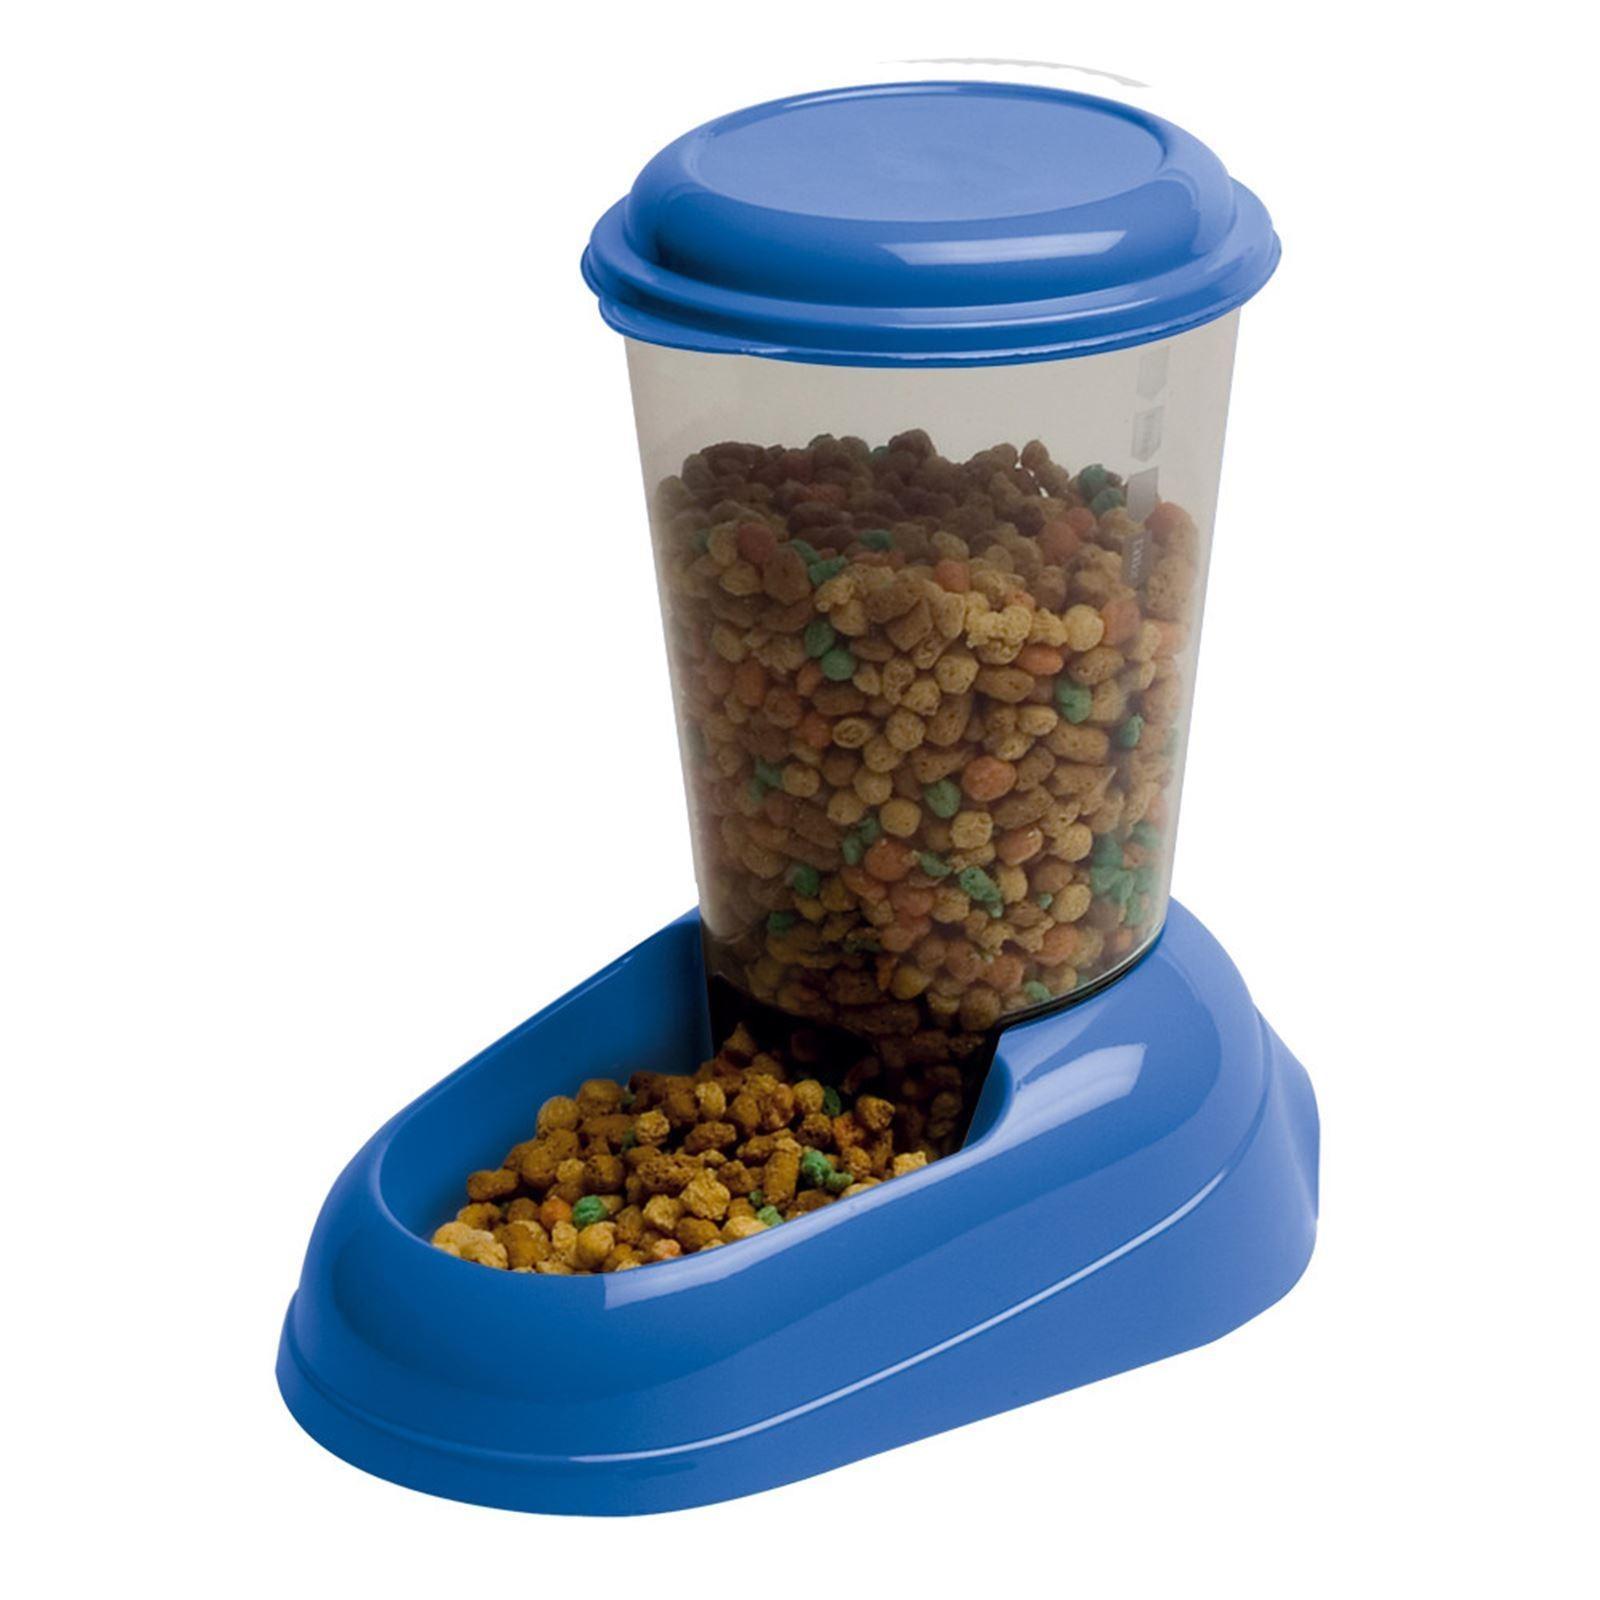 Ferplast Zenith Food Dispenser 3L - Blue